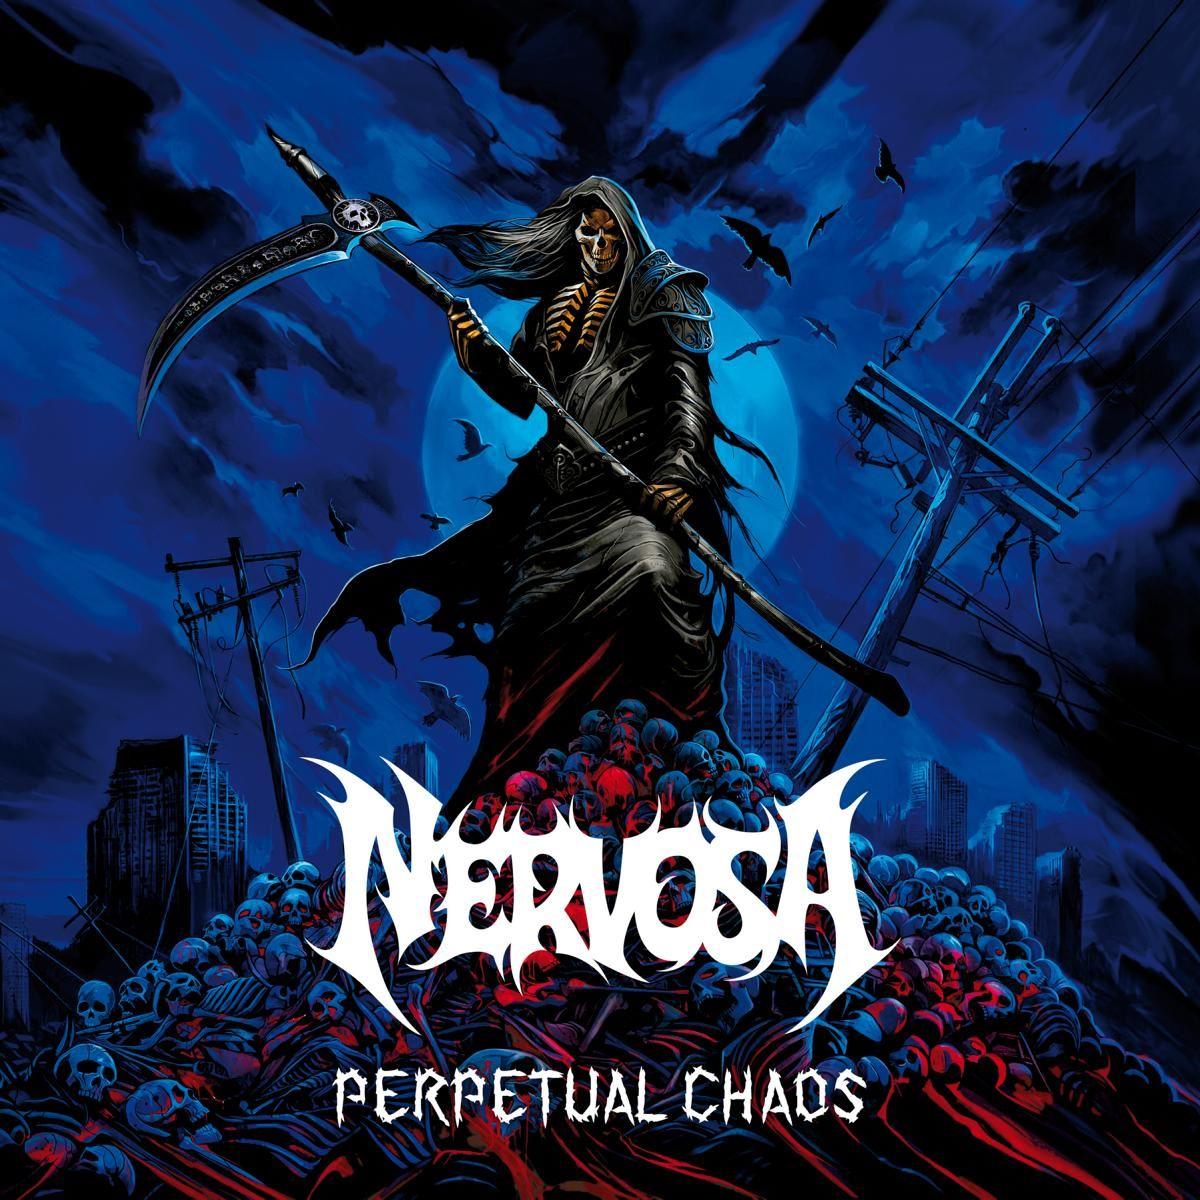 nervosa - perpetual chaos - album cover